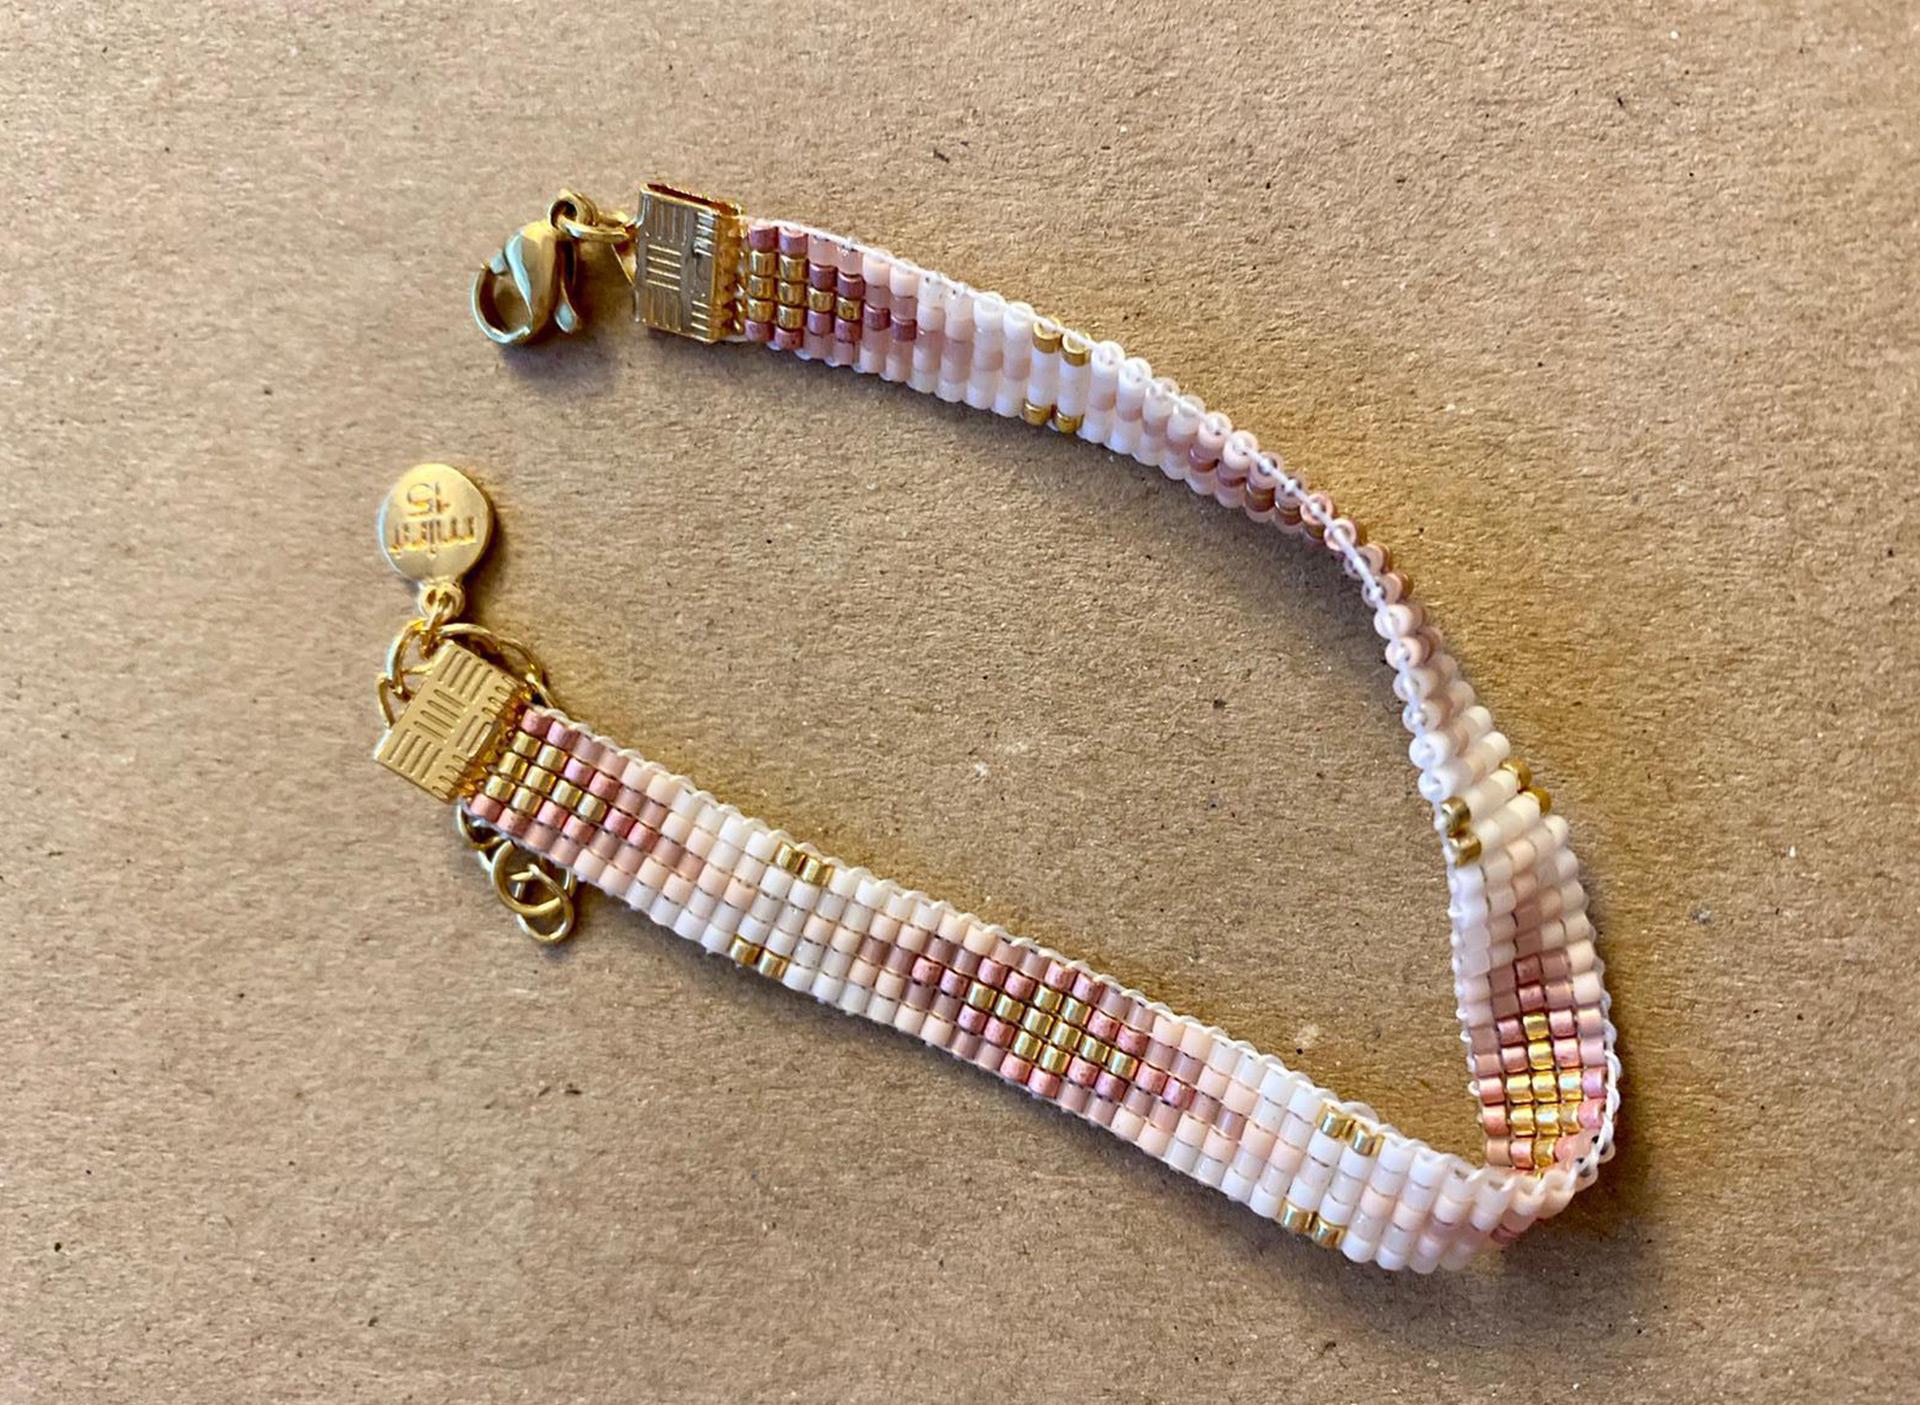 Perlenarmband - verschiedene Farben